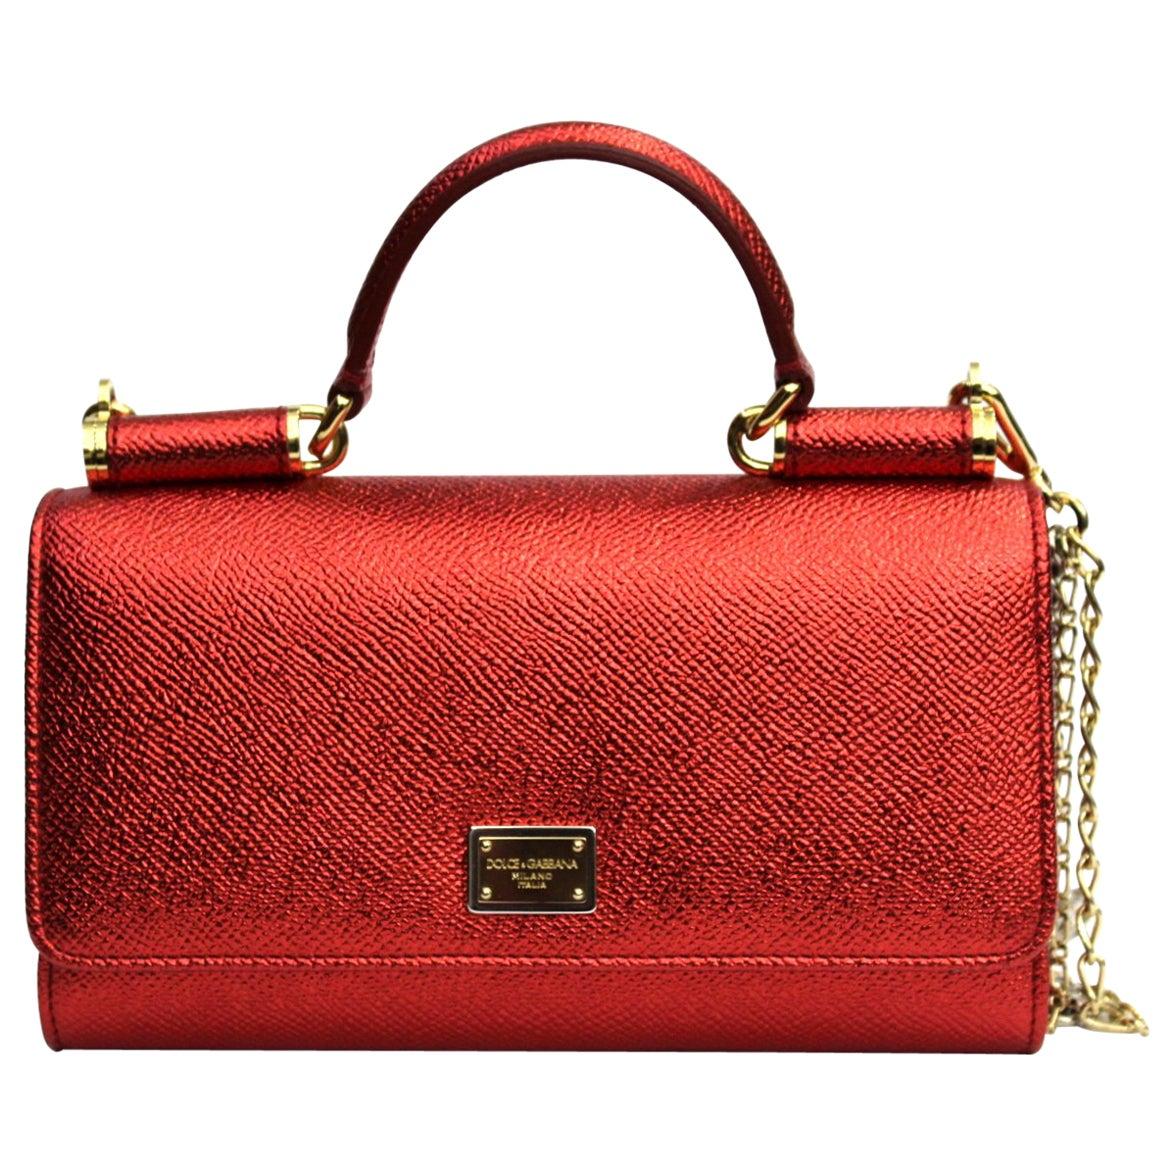 Dolce & Gabbana Red Laminated Leather Mini Von Bag